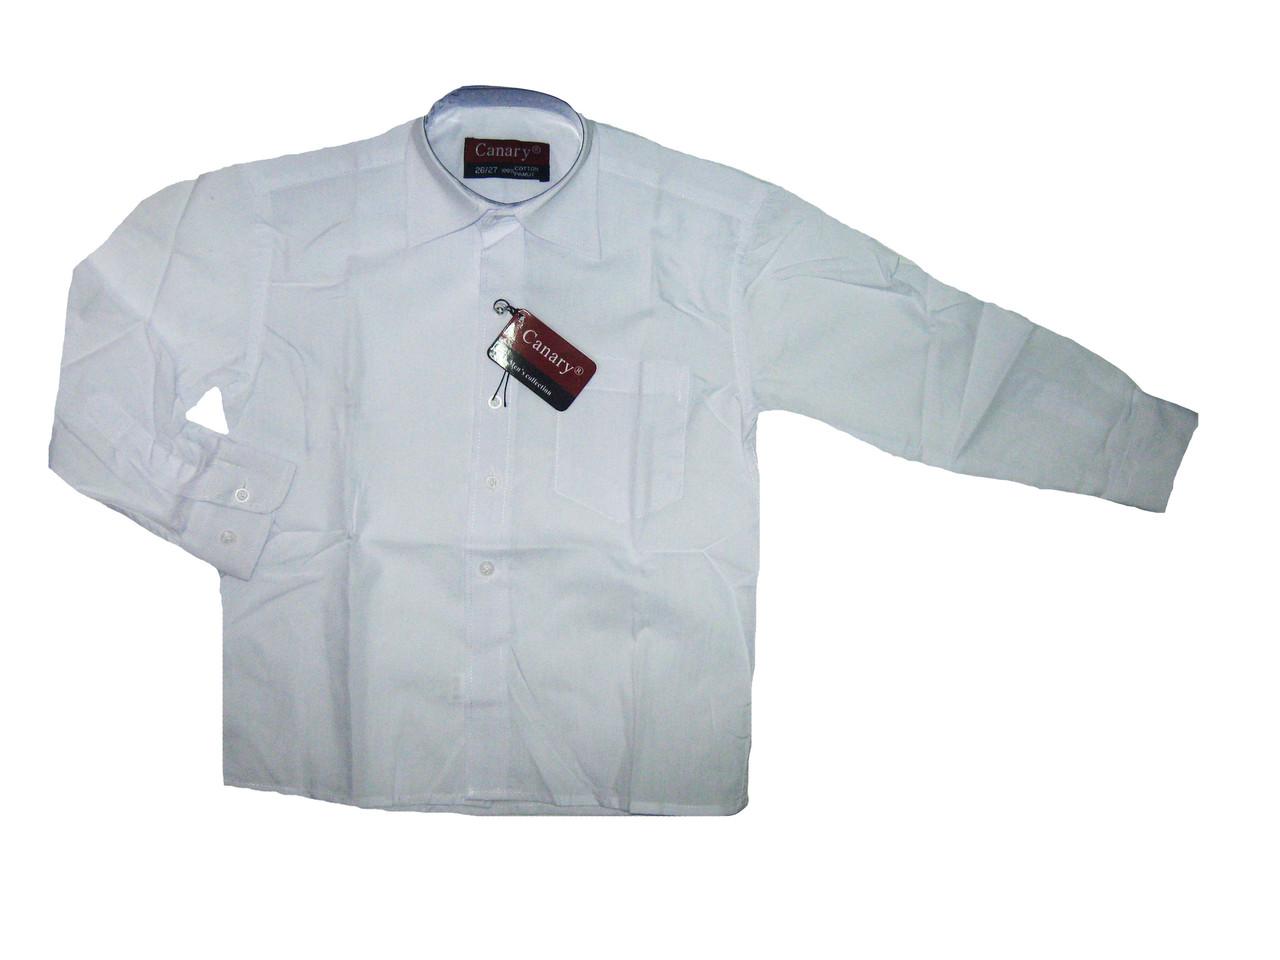 Рубашка для мальчика, Canary, размеры 30/31,34/35 арт. R-008